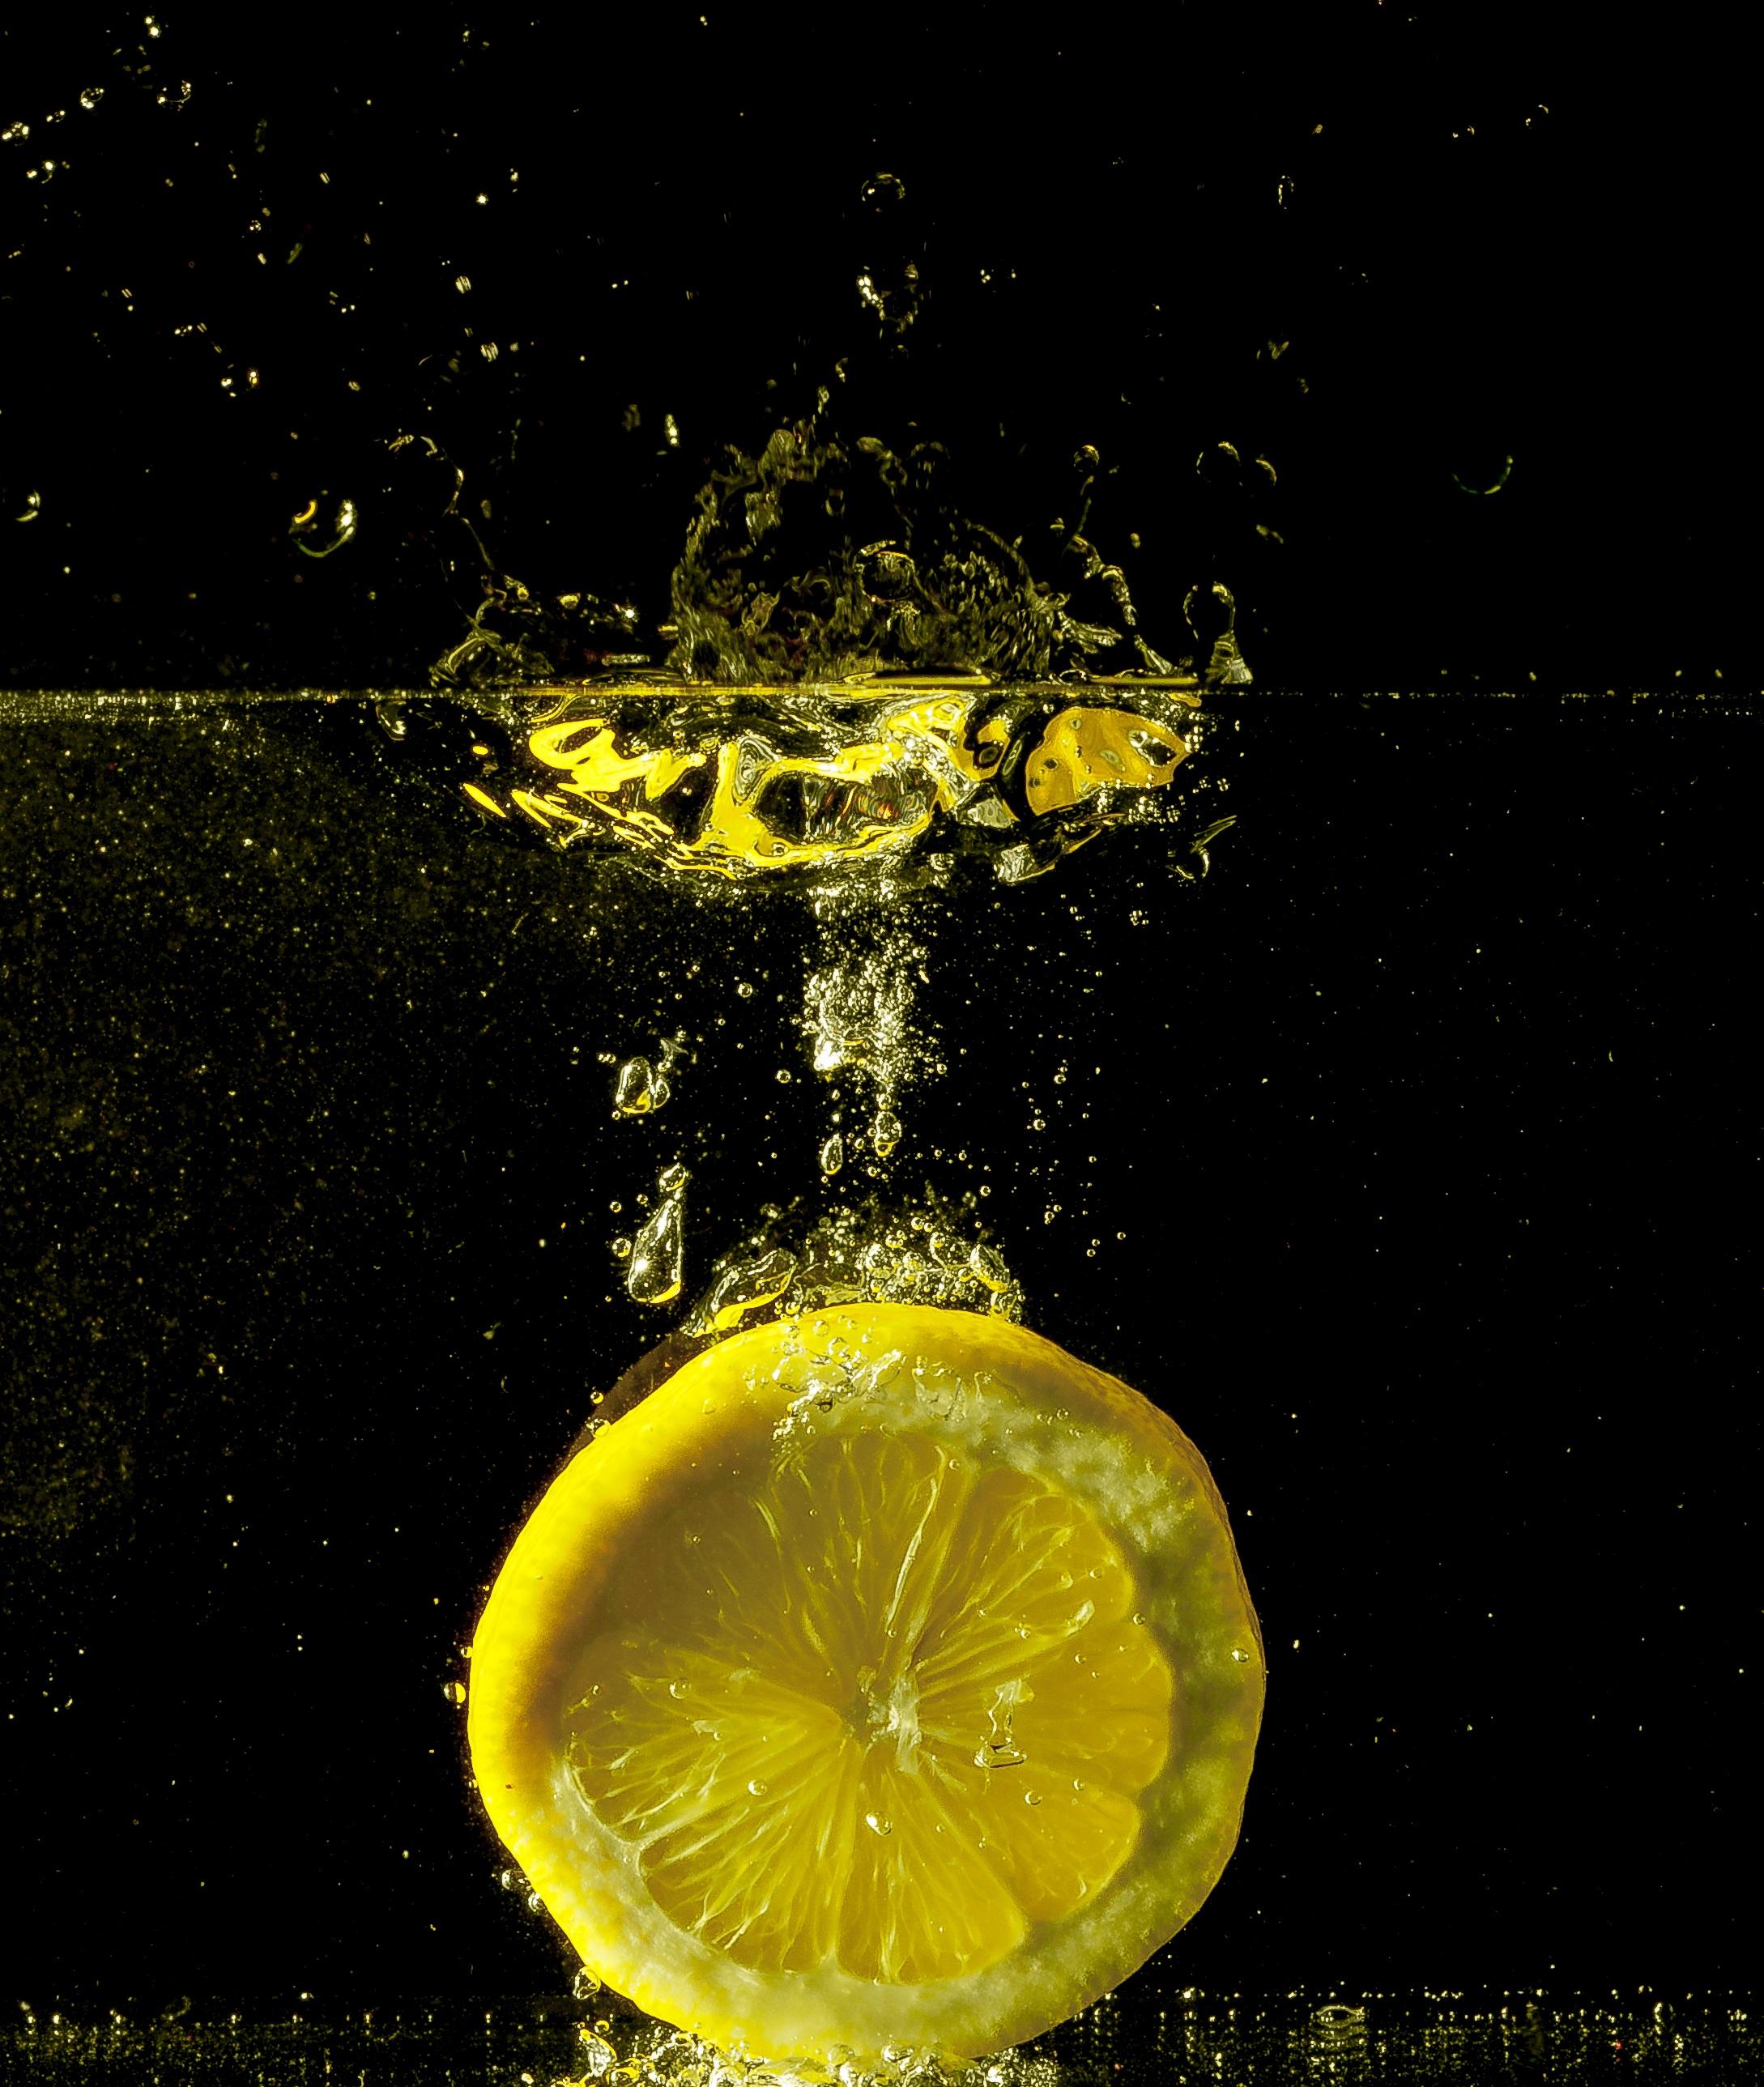 New Year Hd Wallpaper 2014 Free Stock Photo Of Fruit Lemon Lemonade